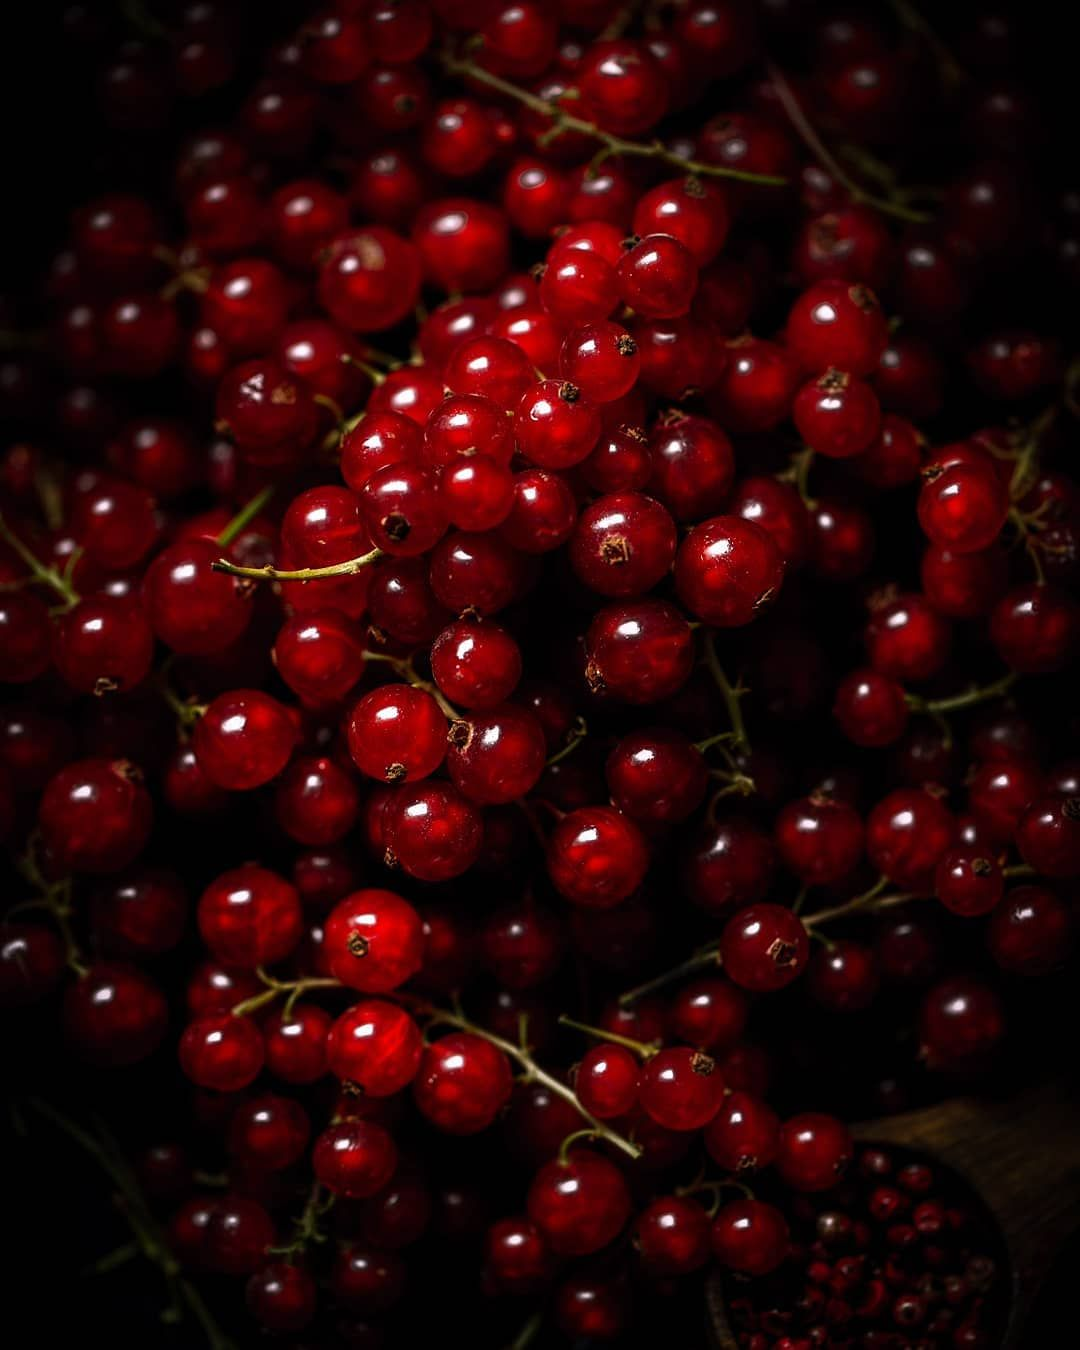 Fresh Red Currants Local Seasonal Food Photography By Boiledbeanstudio In 2020 Seasonal Produce Guide Local Fruit Fruit Plants